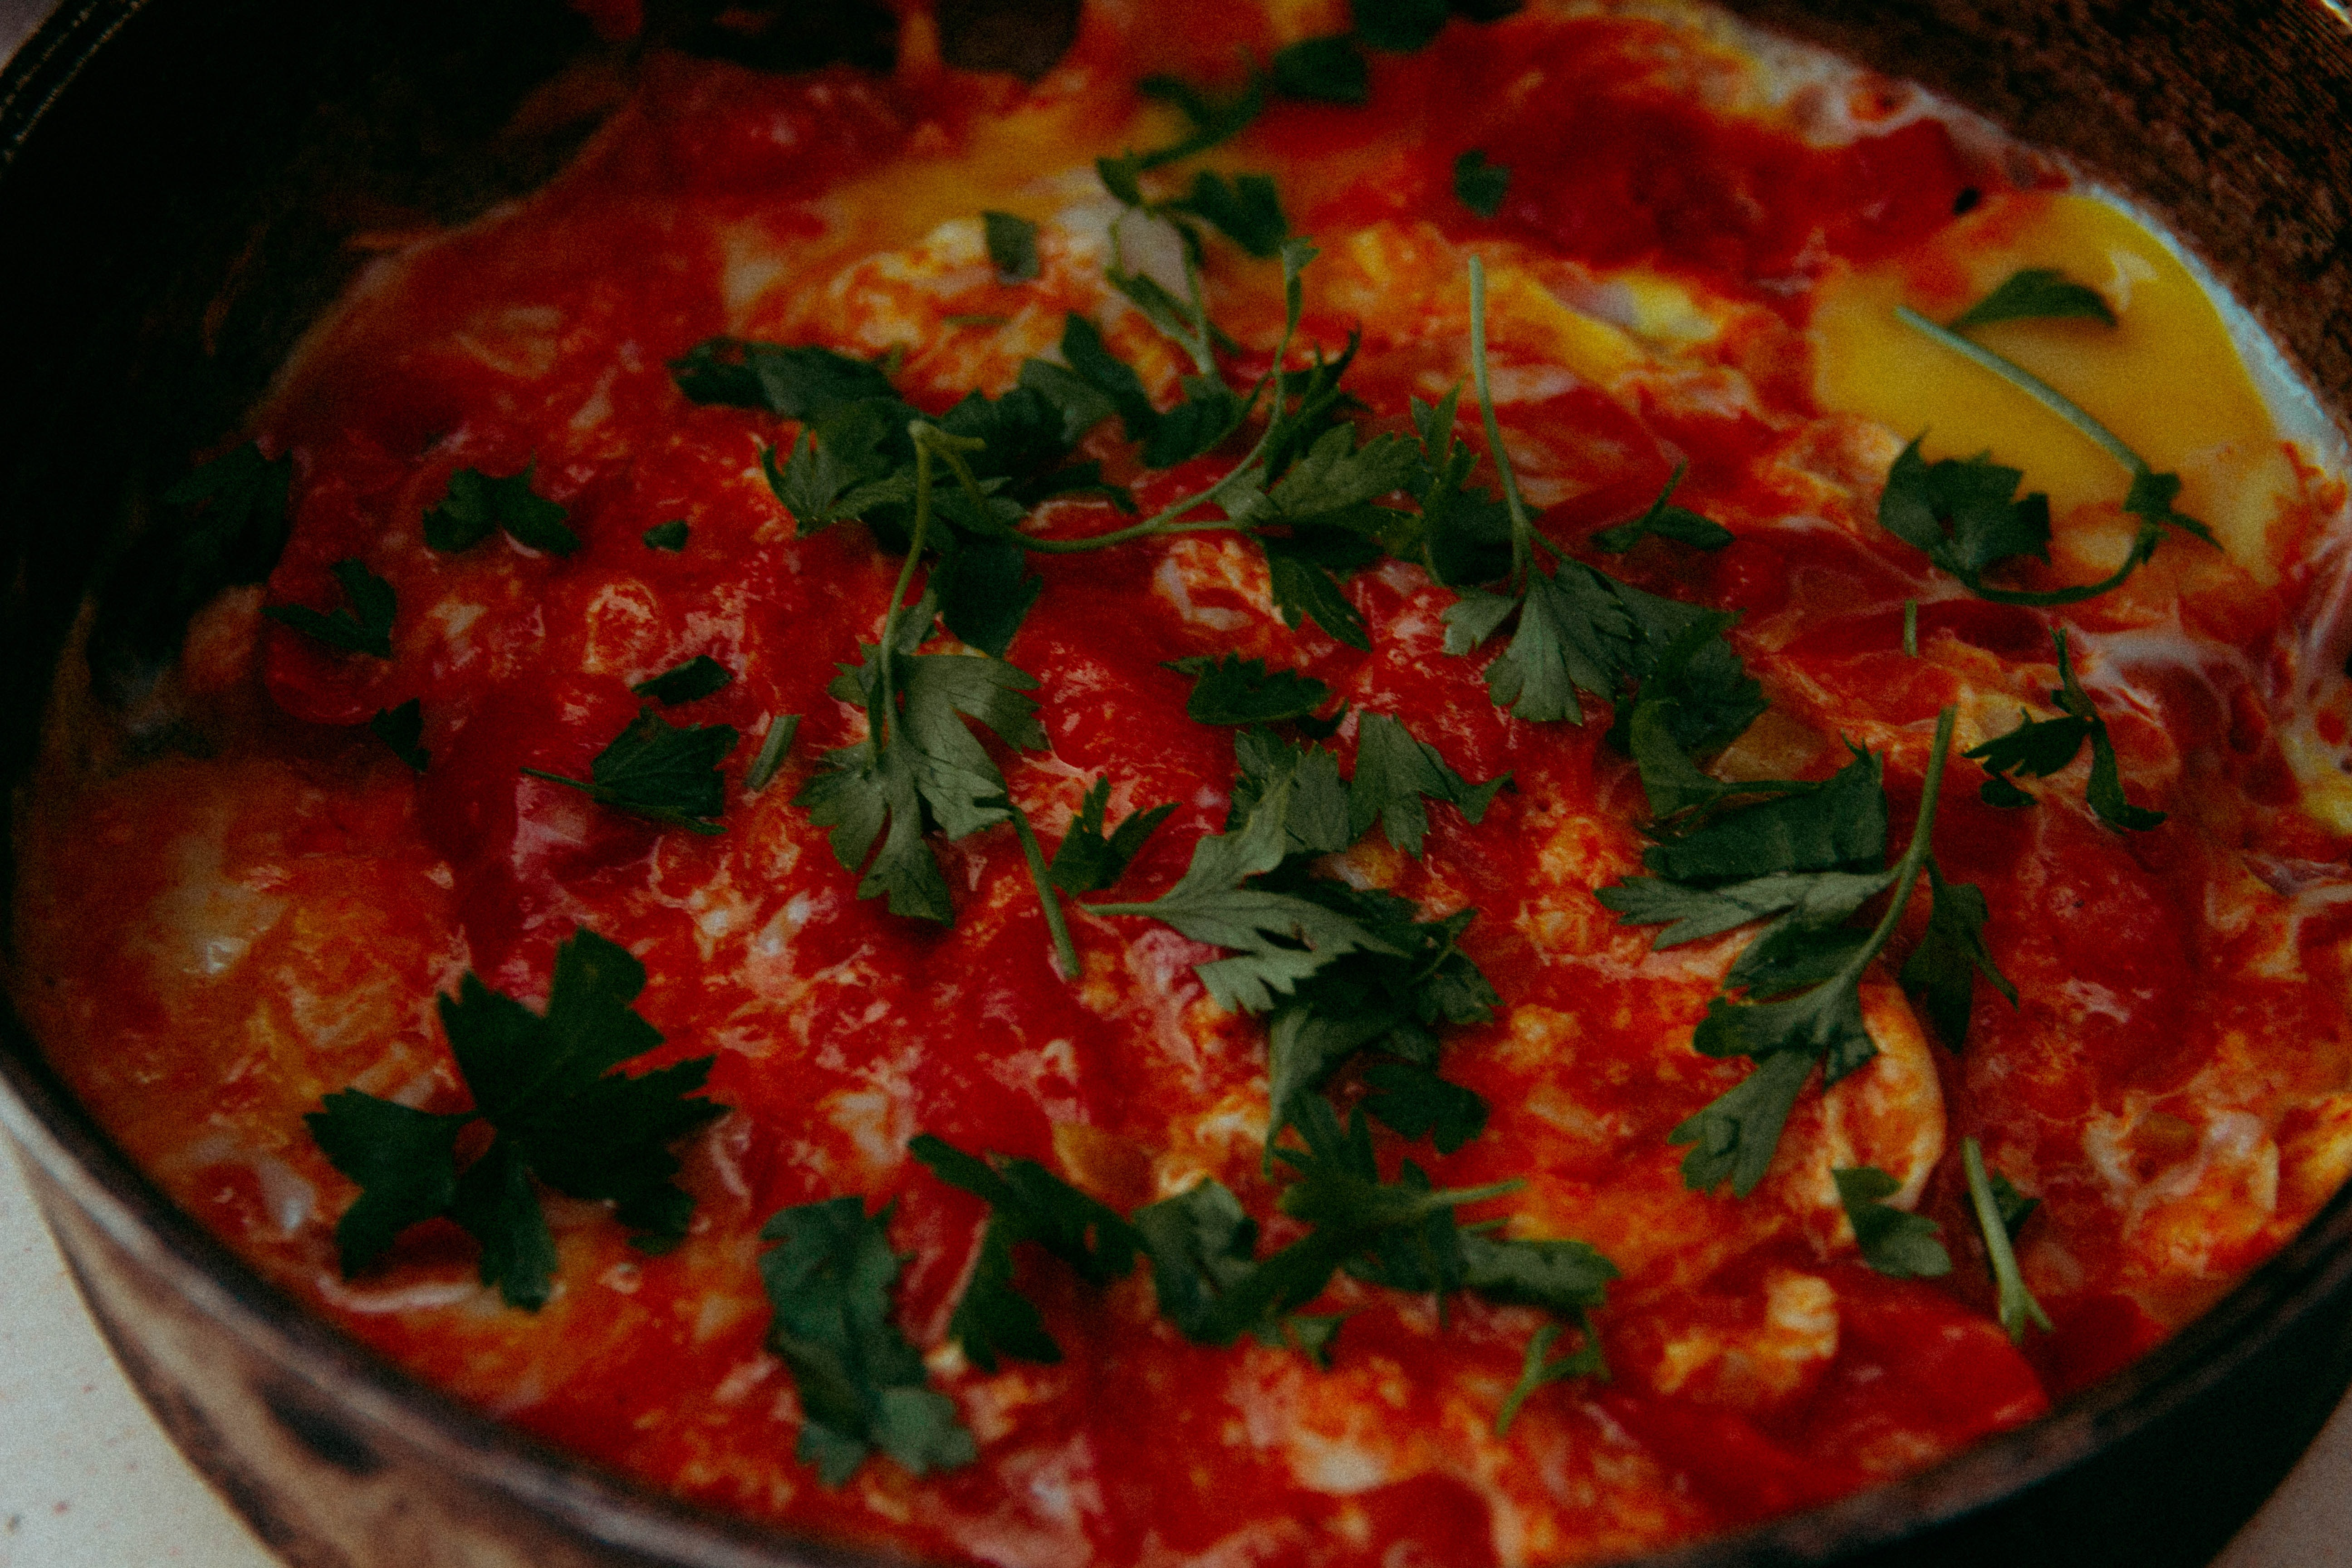 tomato sauce_unsplash.jpg